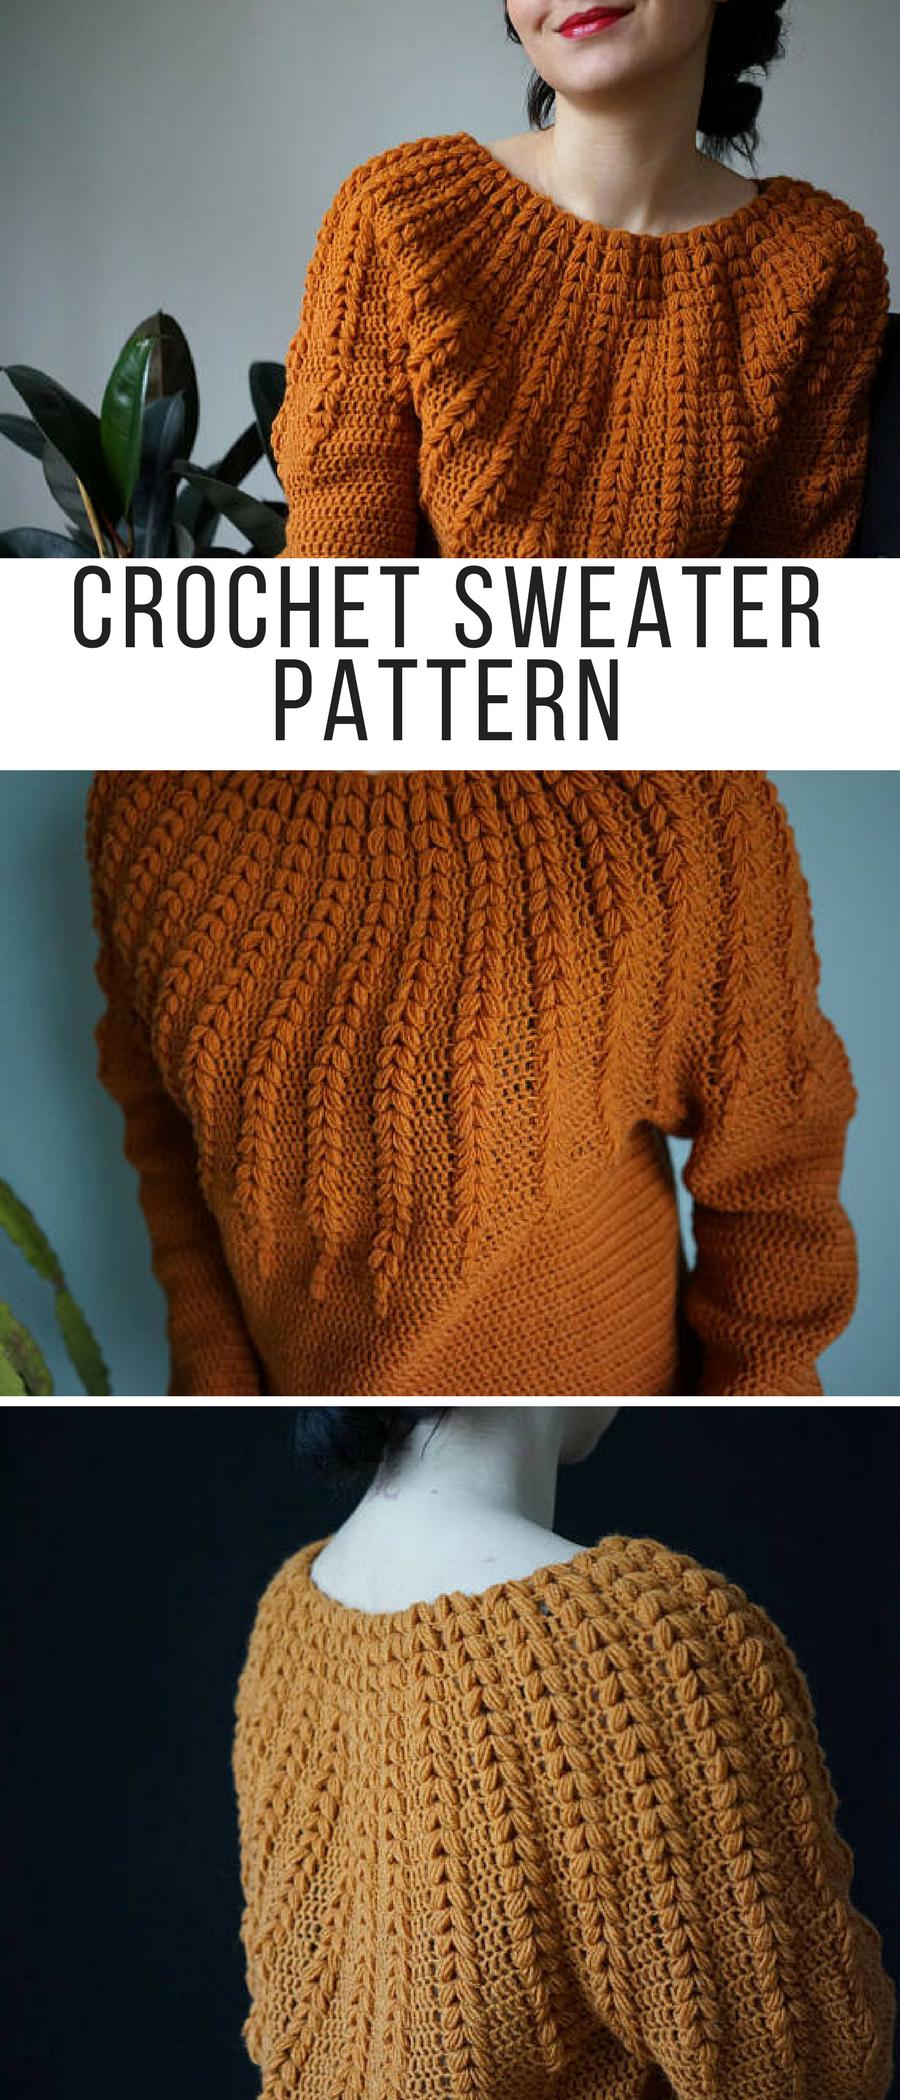 Goldenrod Sweater Crochet pattern by ElevenHandmade